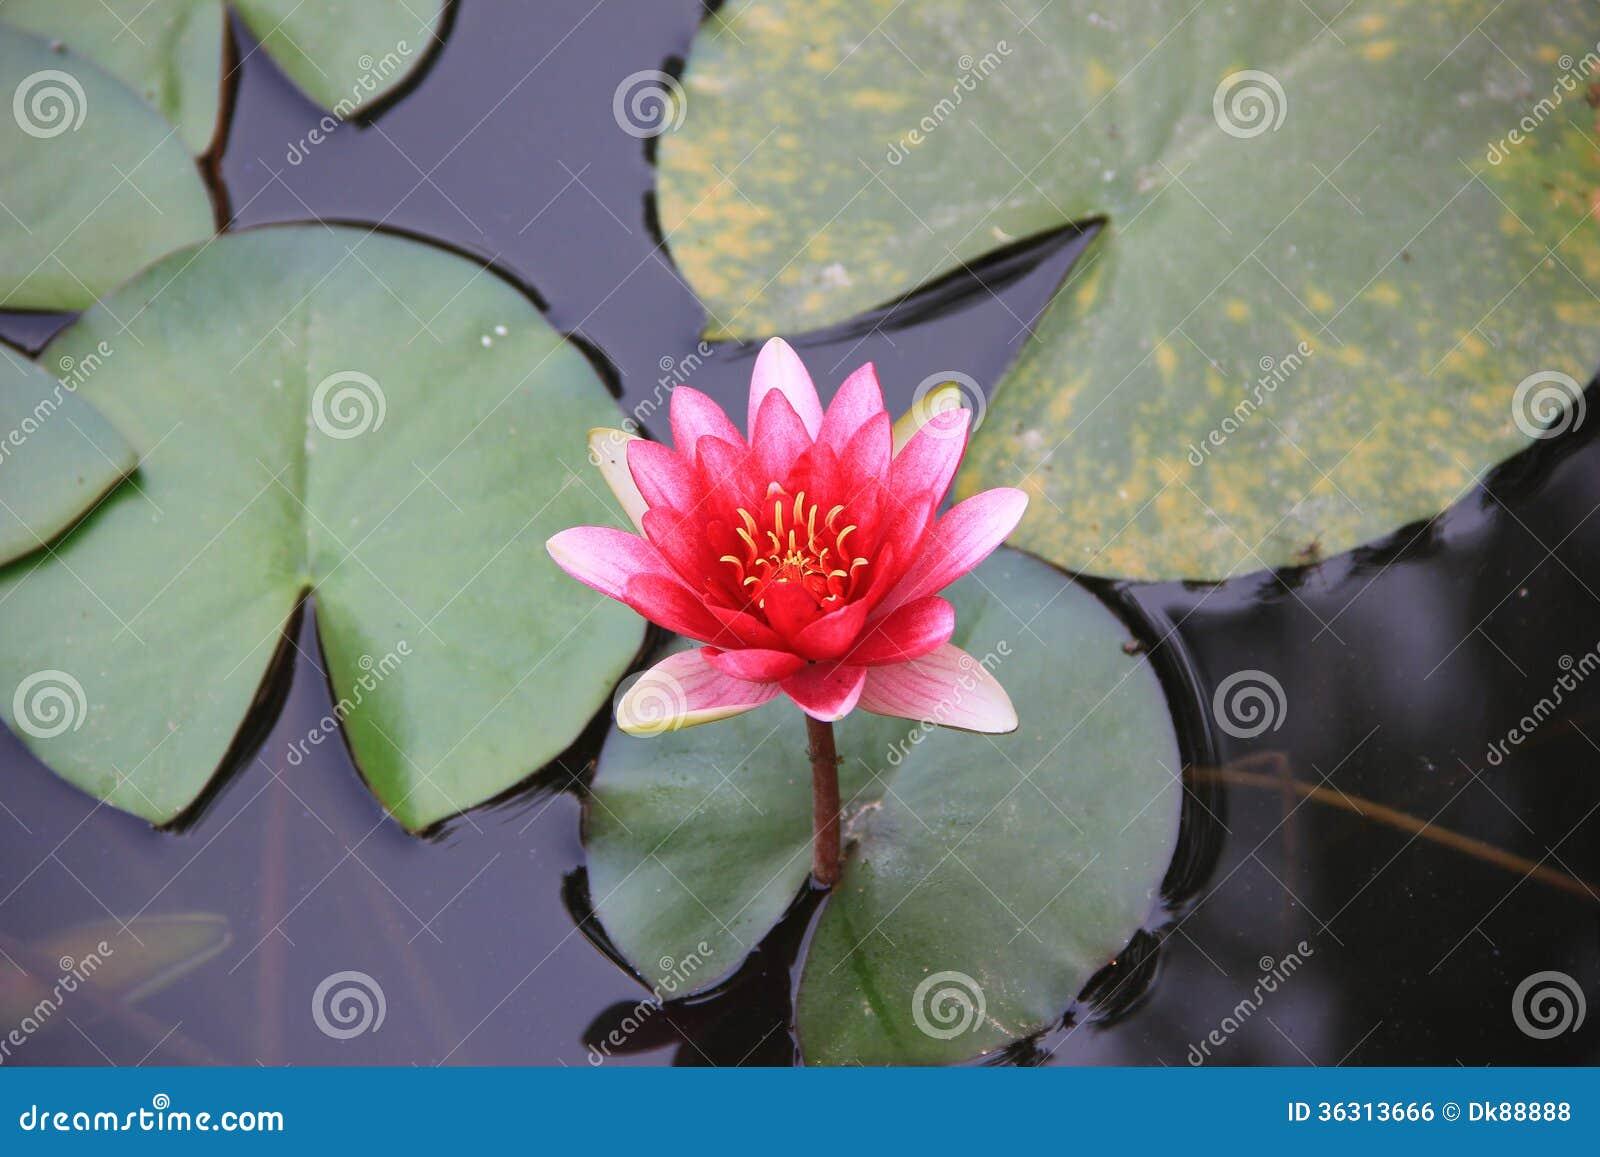 Lotus Flower Stock Photo Image Of Deep Botany Blooming 36313666